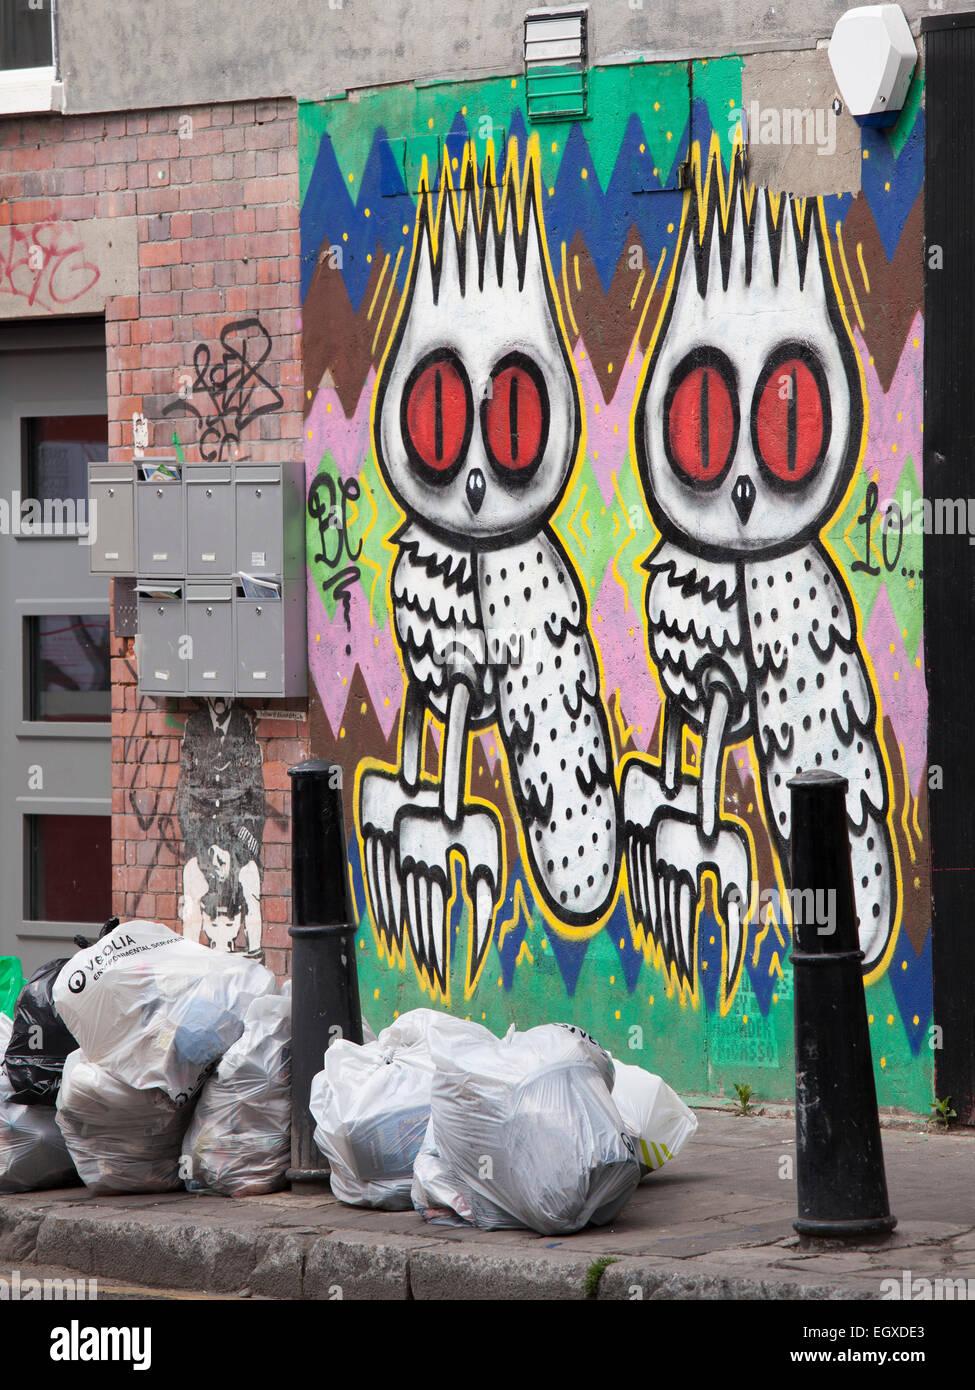 Grafitti near City of London - Stock Image